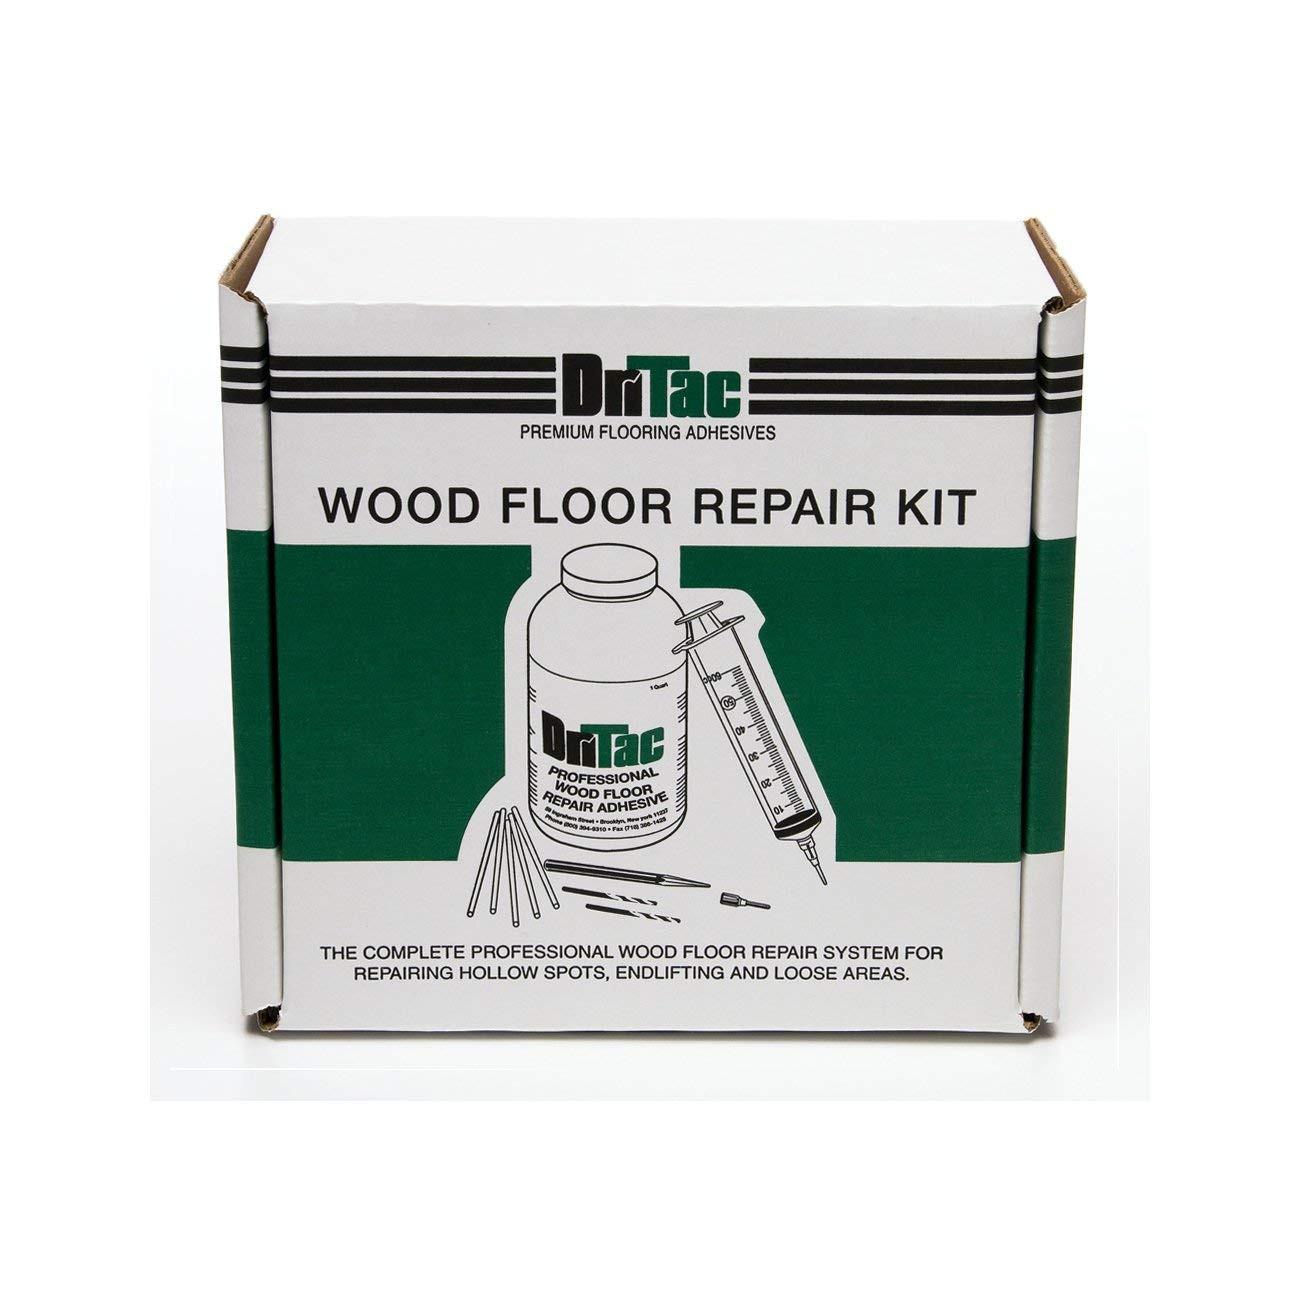 hardwood floor rejuvenator home depot of amazon com dritac wood floor repair kit engineered flooring only in amazon com dritac wood floor repair kit engineered flooring only 32oz home kitchen